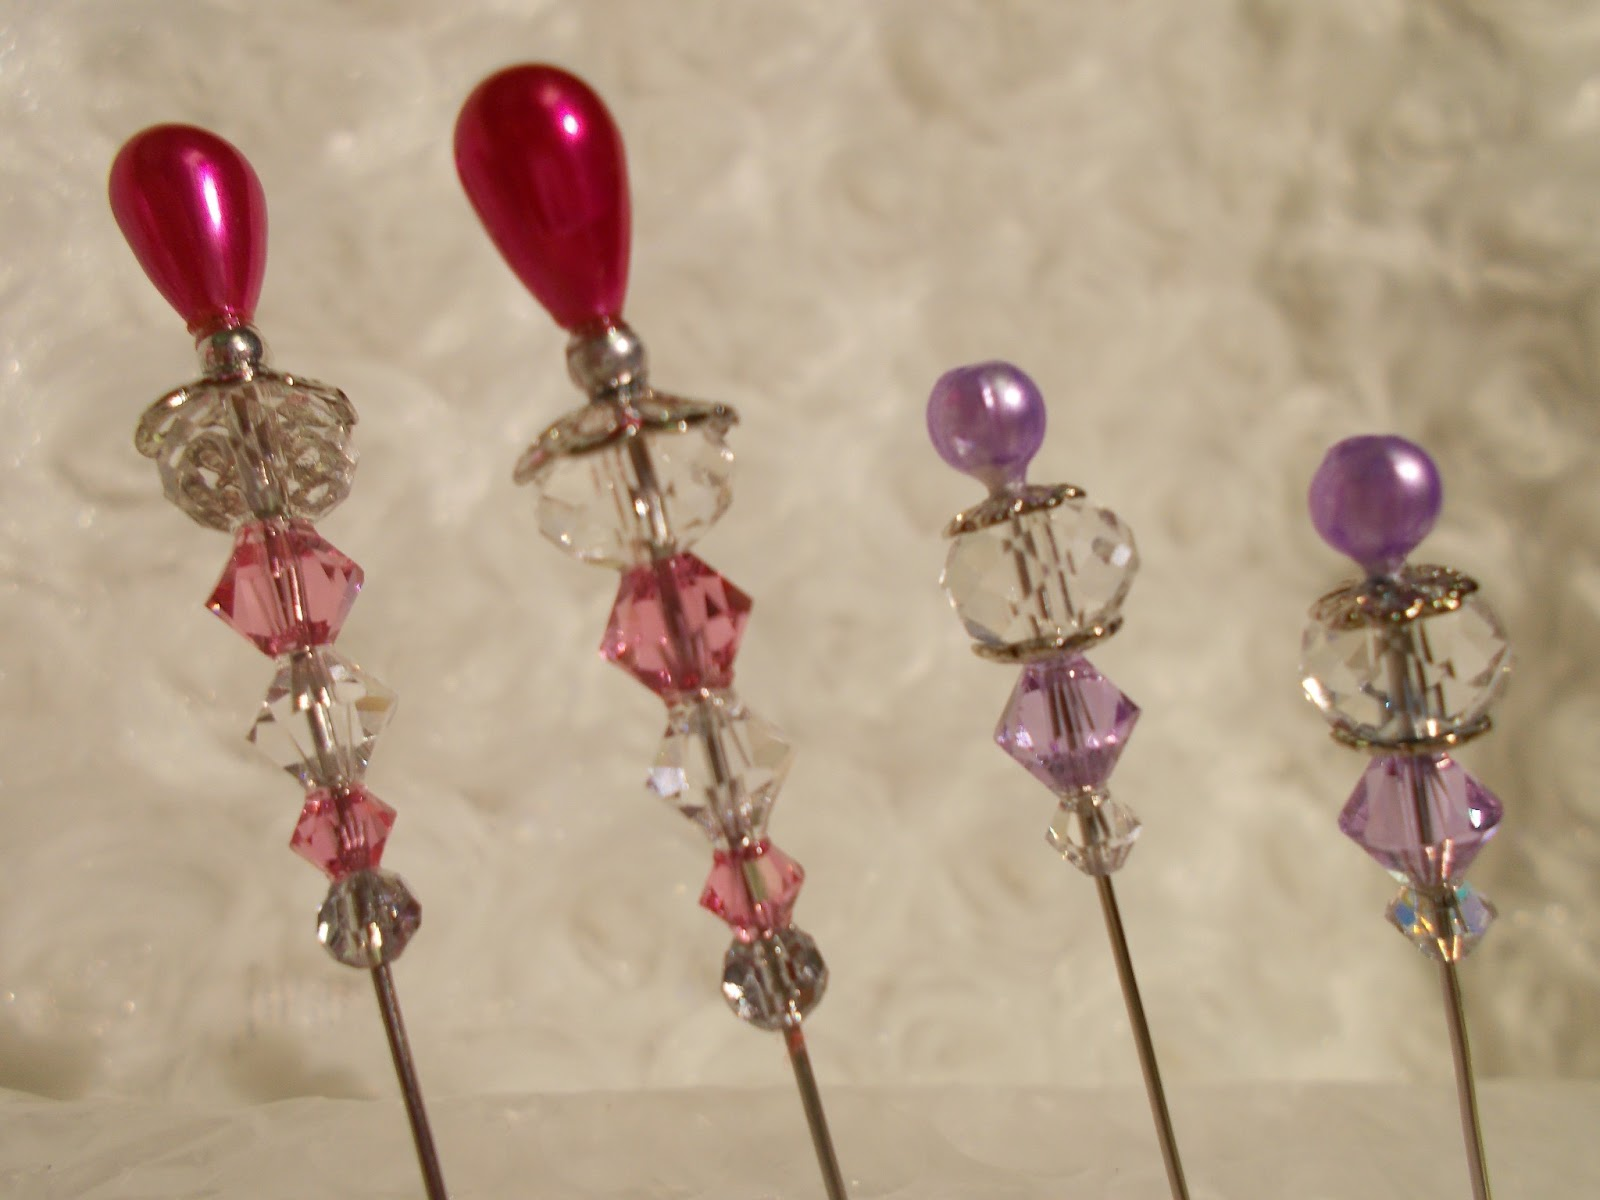 Stick pins for crafts - Stick Pins For Crafts 3